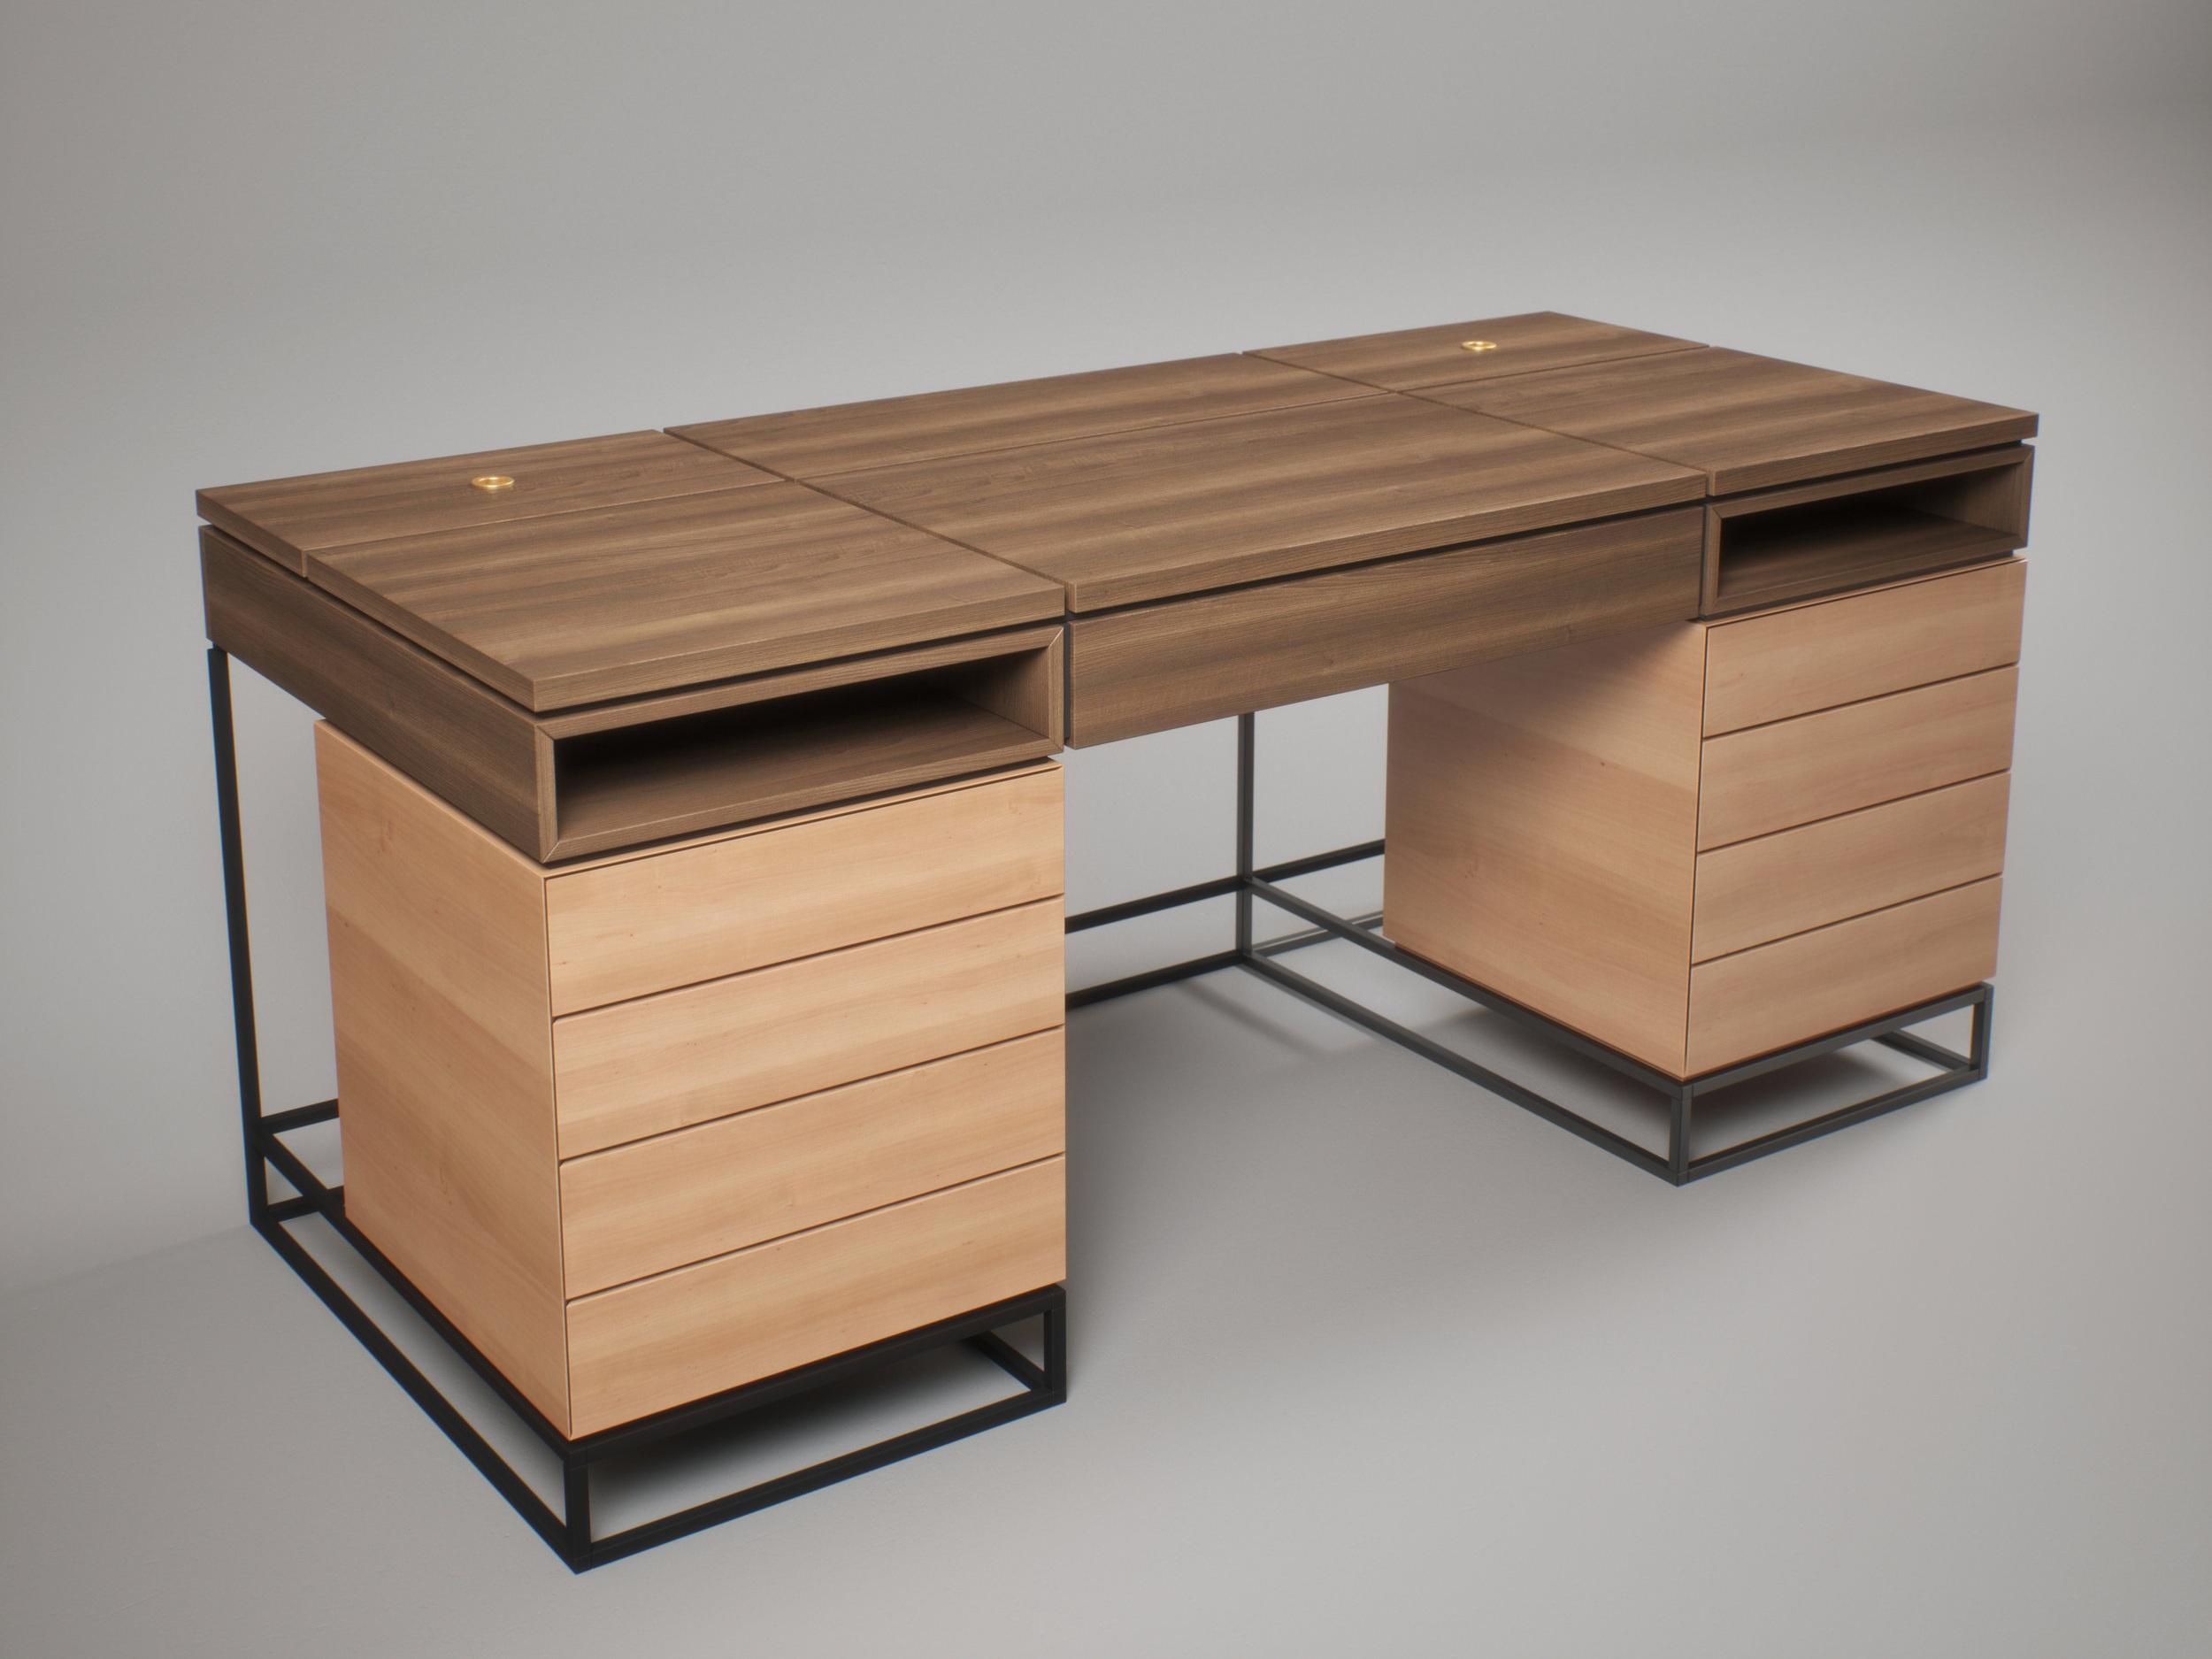 Table_001wa.jpg